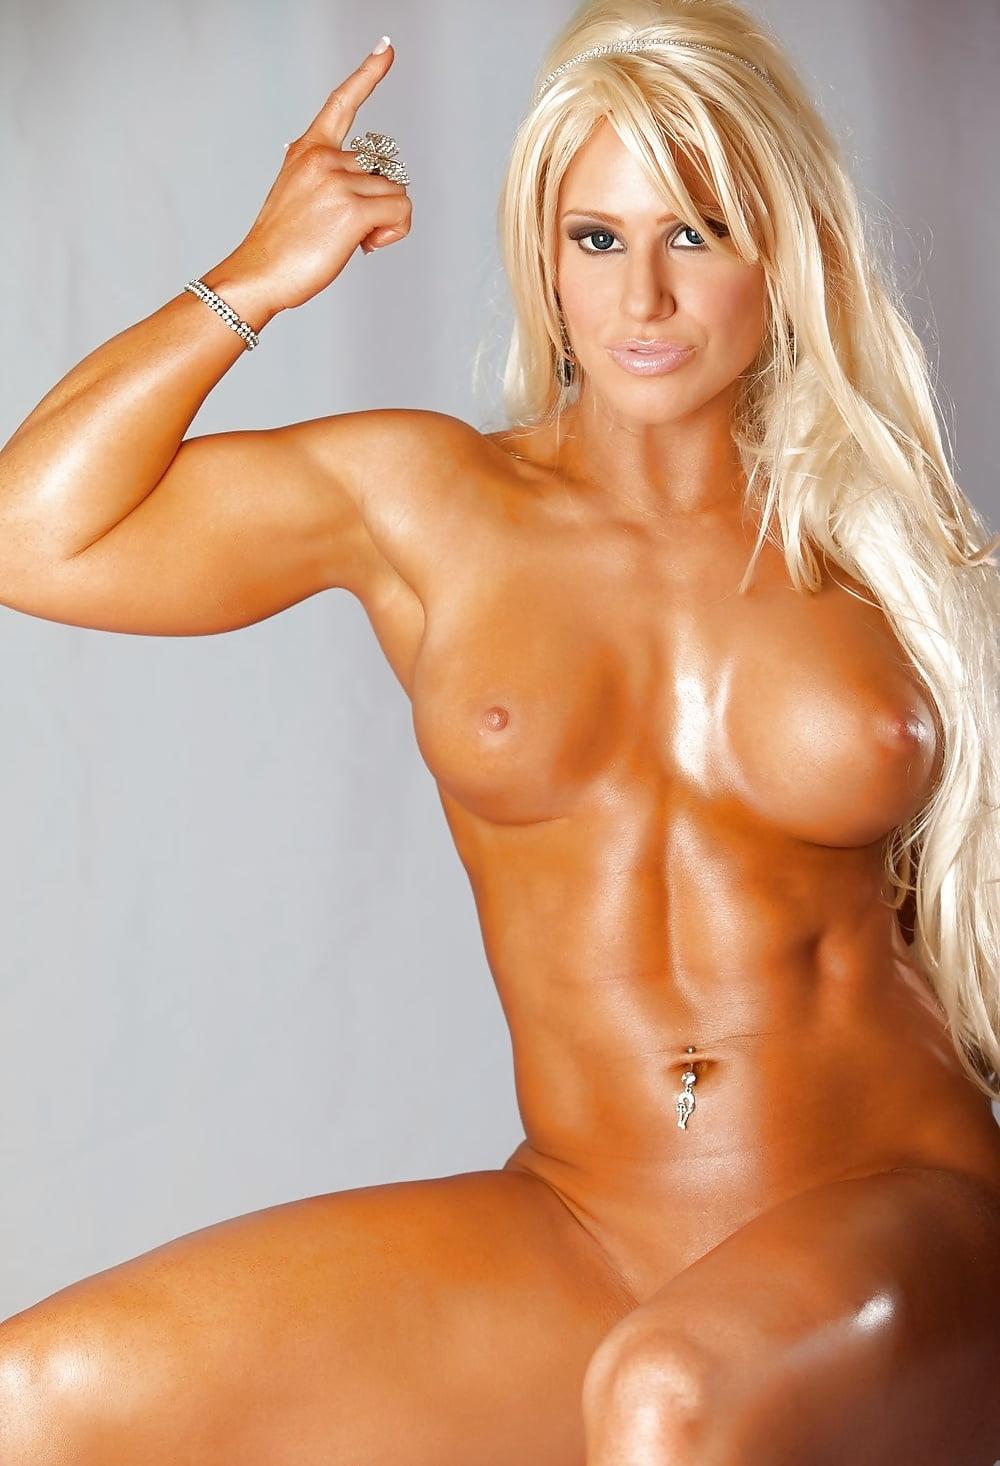 Hd Female Muscle Nude